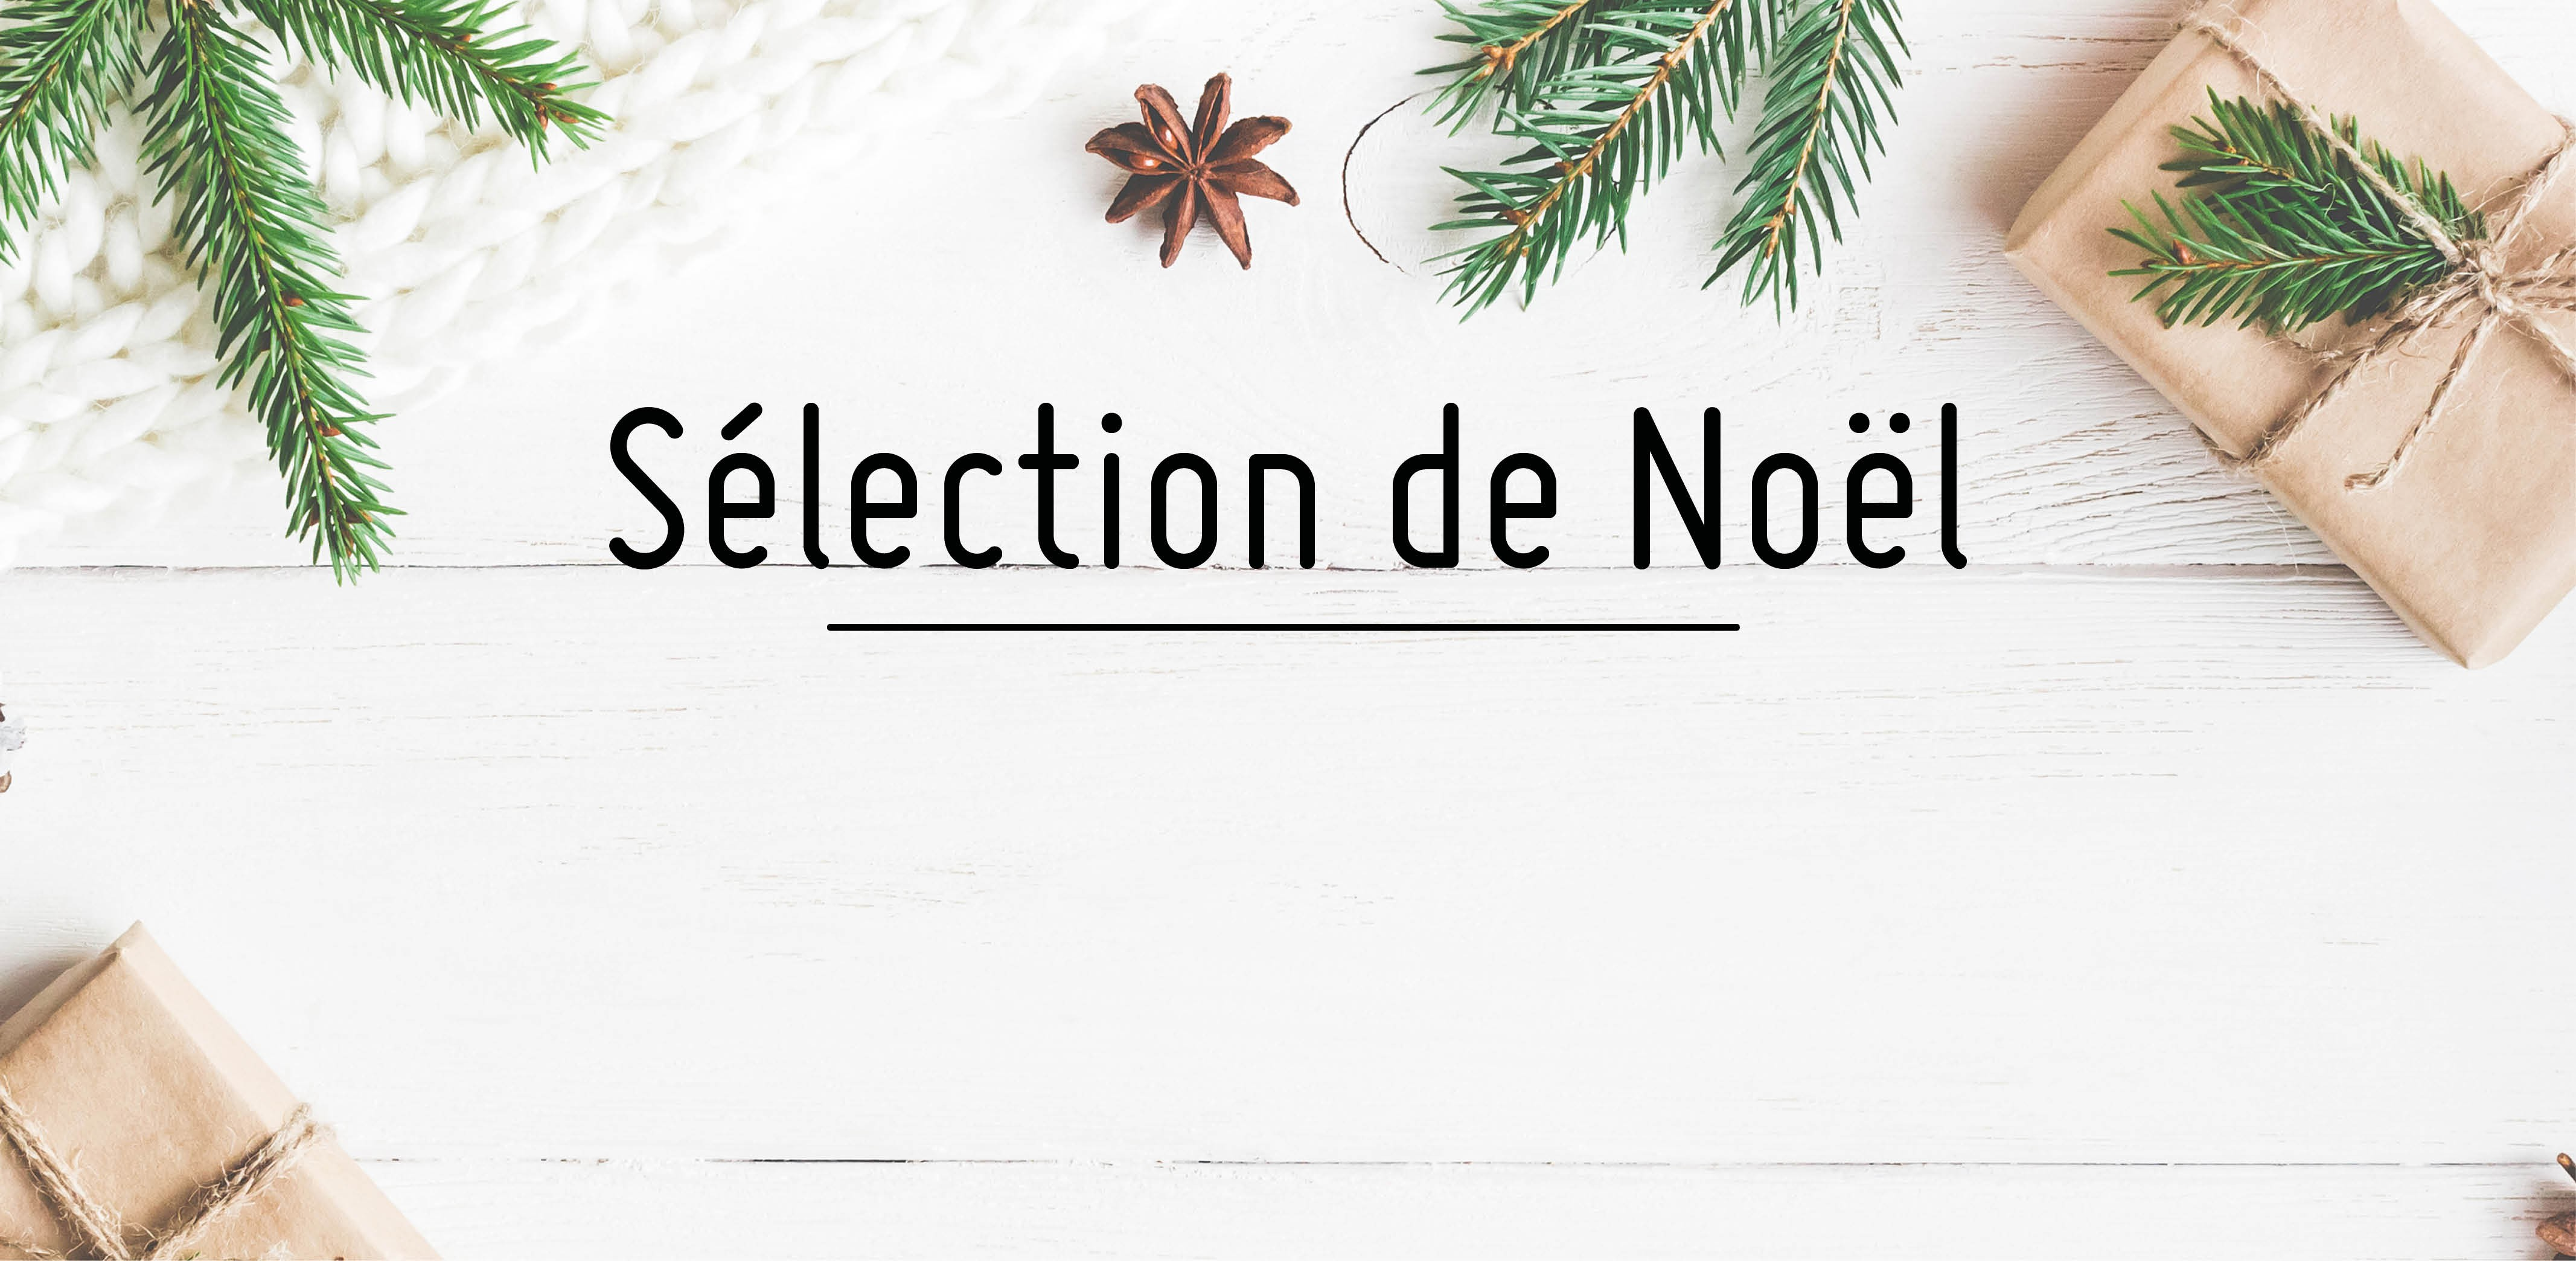 SELECTION DE NOEL